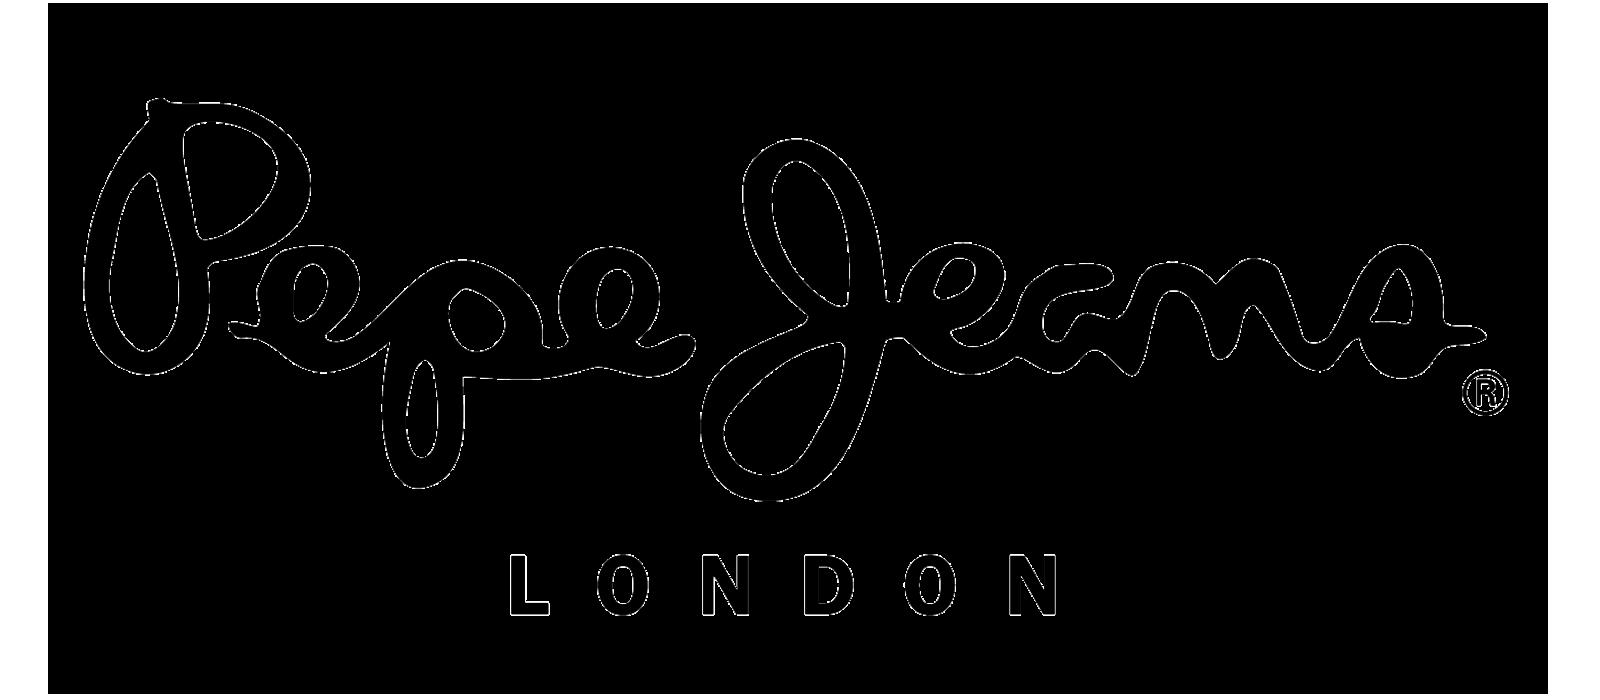 Pepe_Jeans_logo